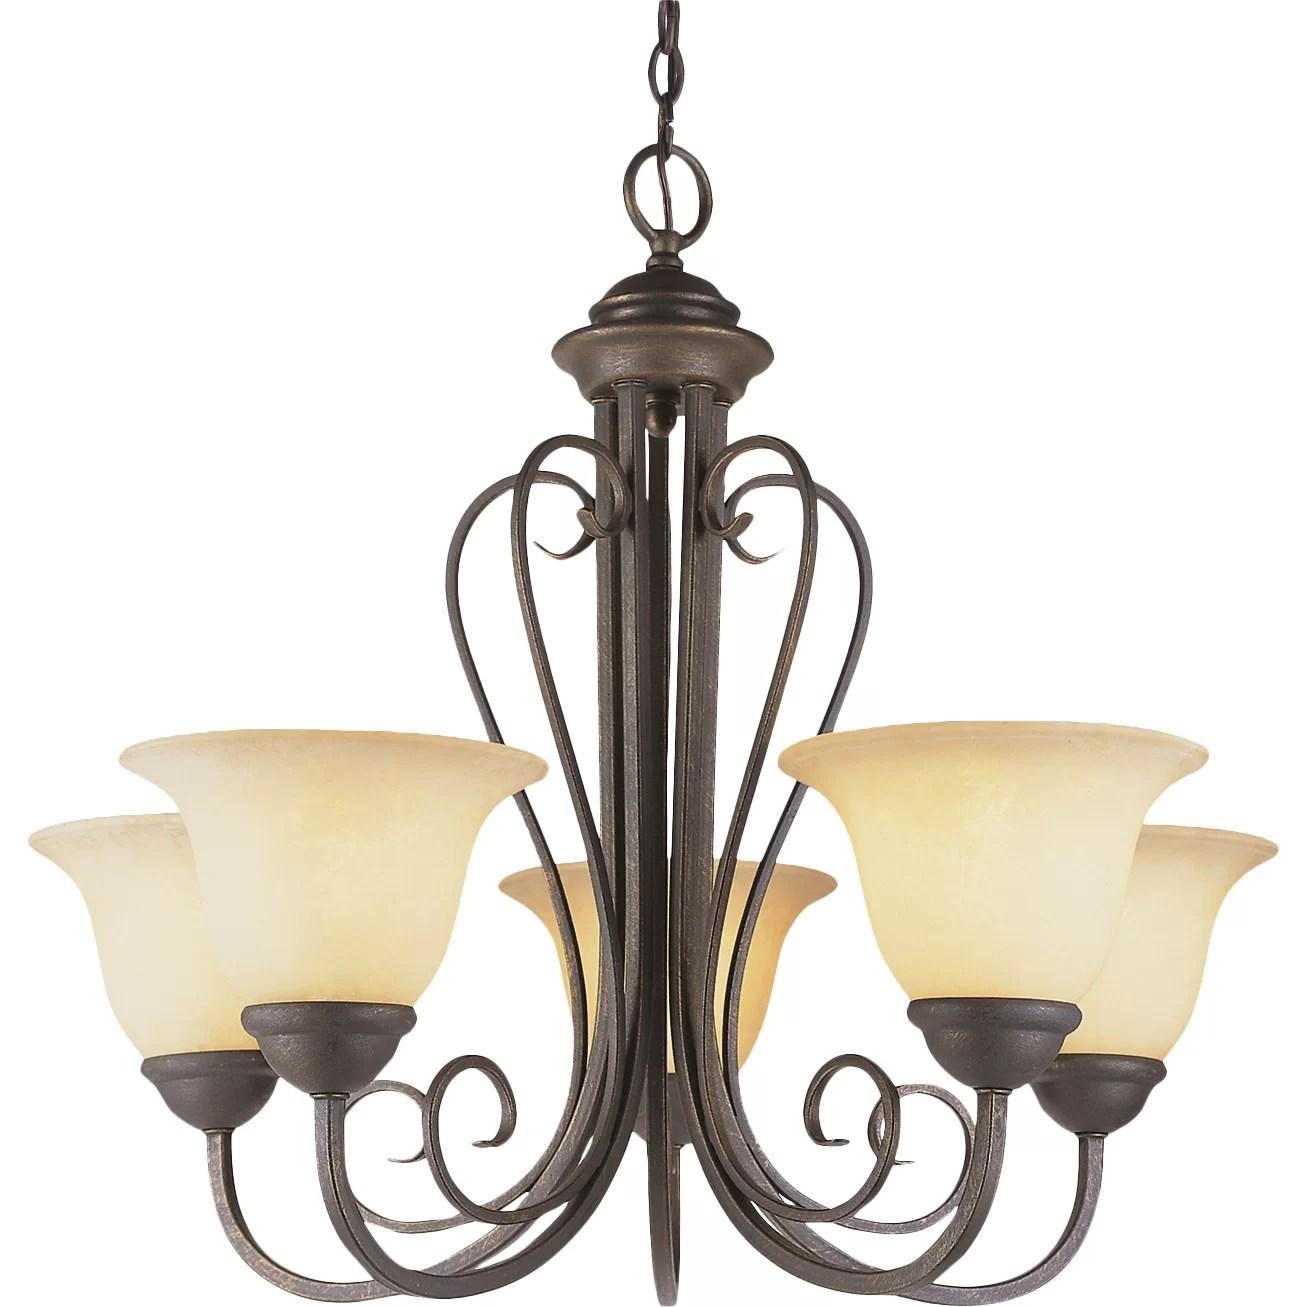 bronze kitchen chandelier wood set transglobe lighting new century 21 25 quot in